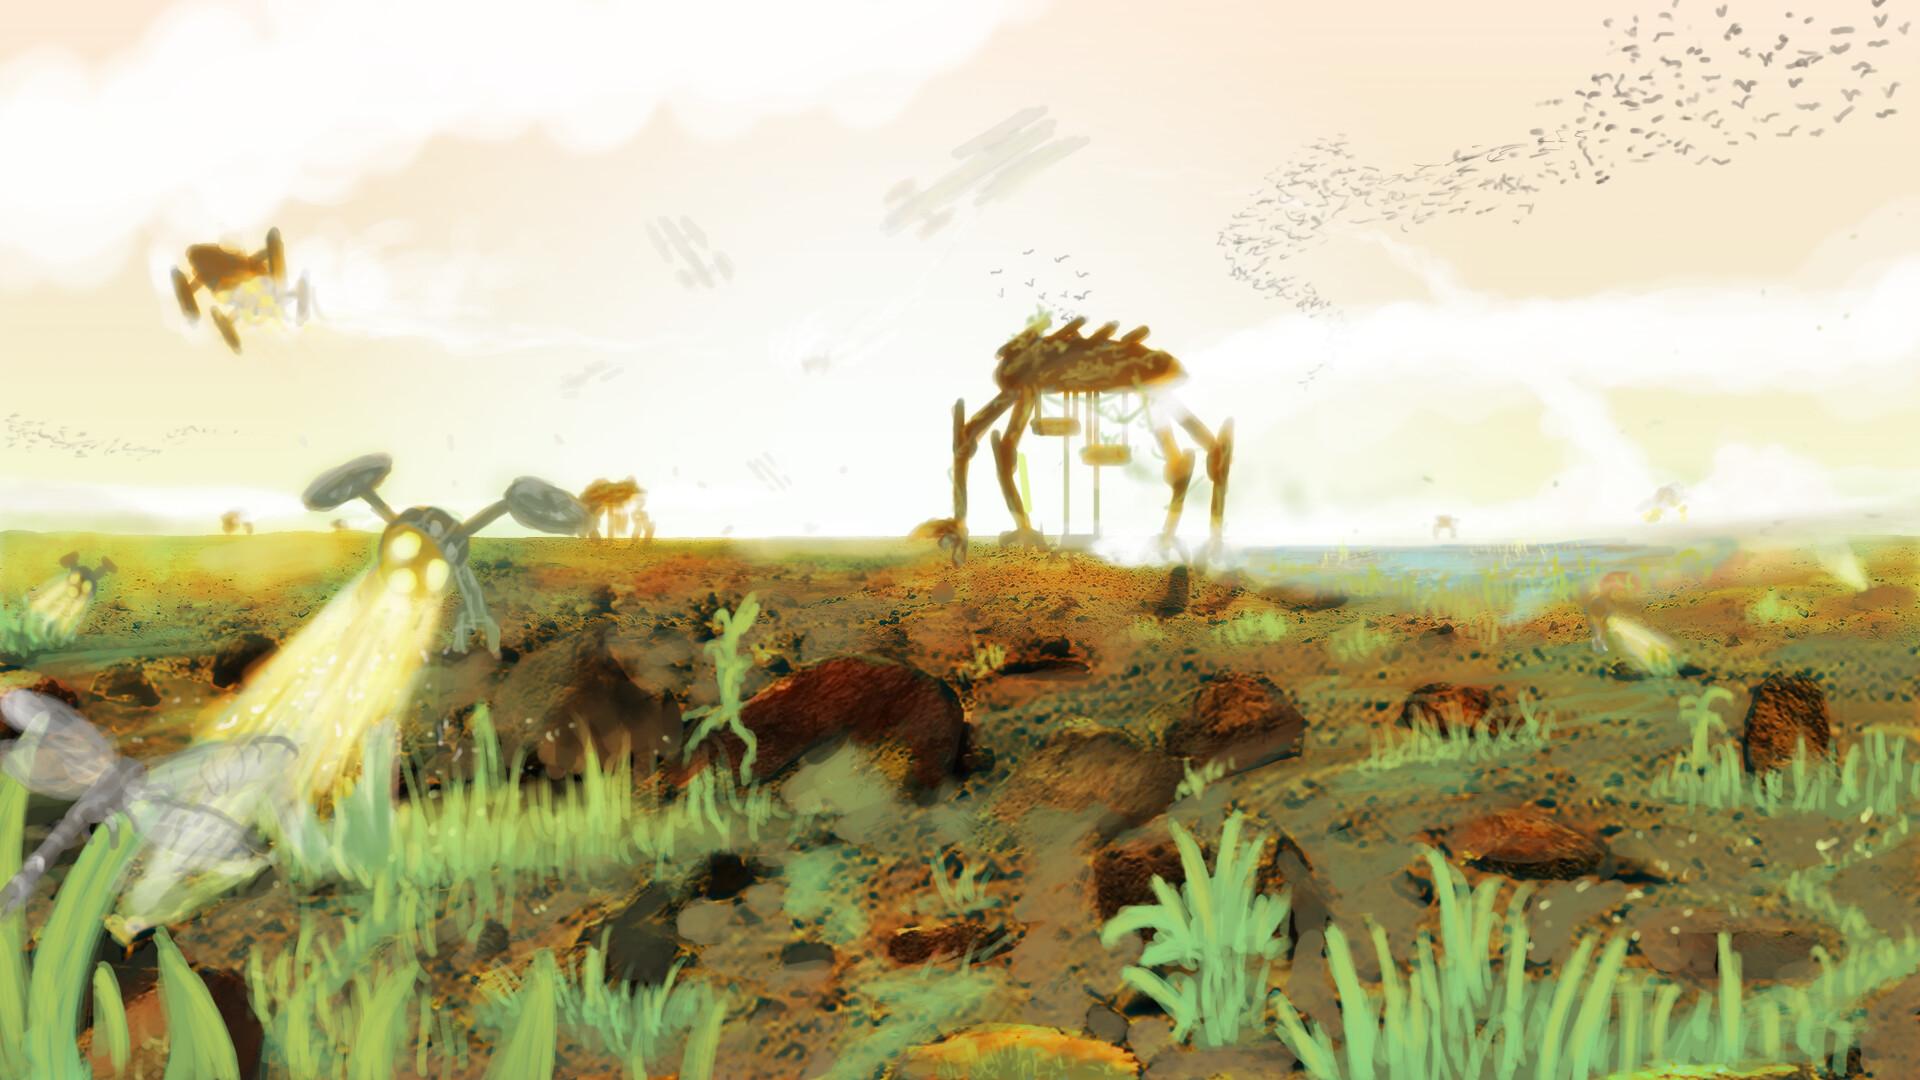 Alexander laheij mars environment